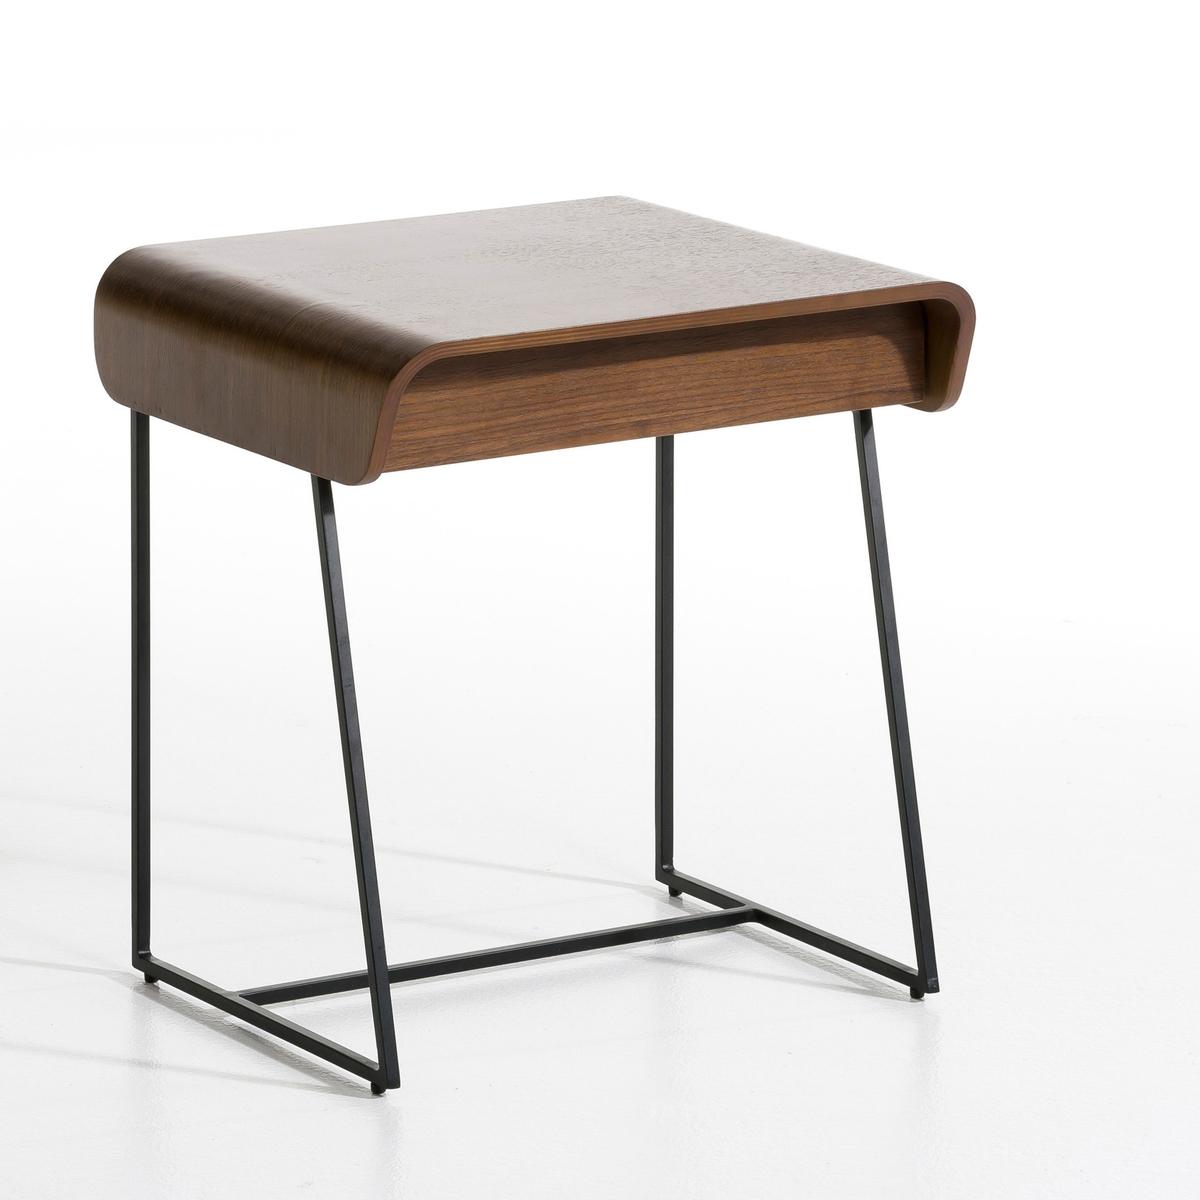 "Nachtschrank ""Bardi"", 1 Schublade, Design E. Gallina"